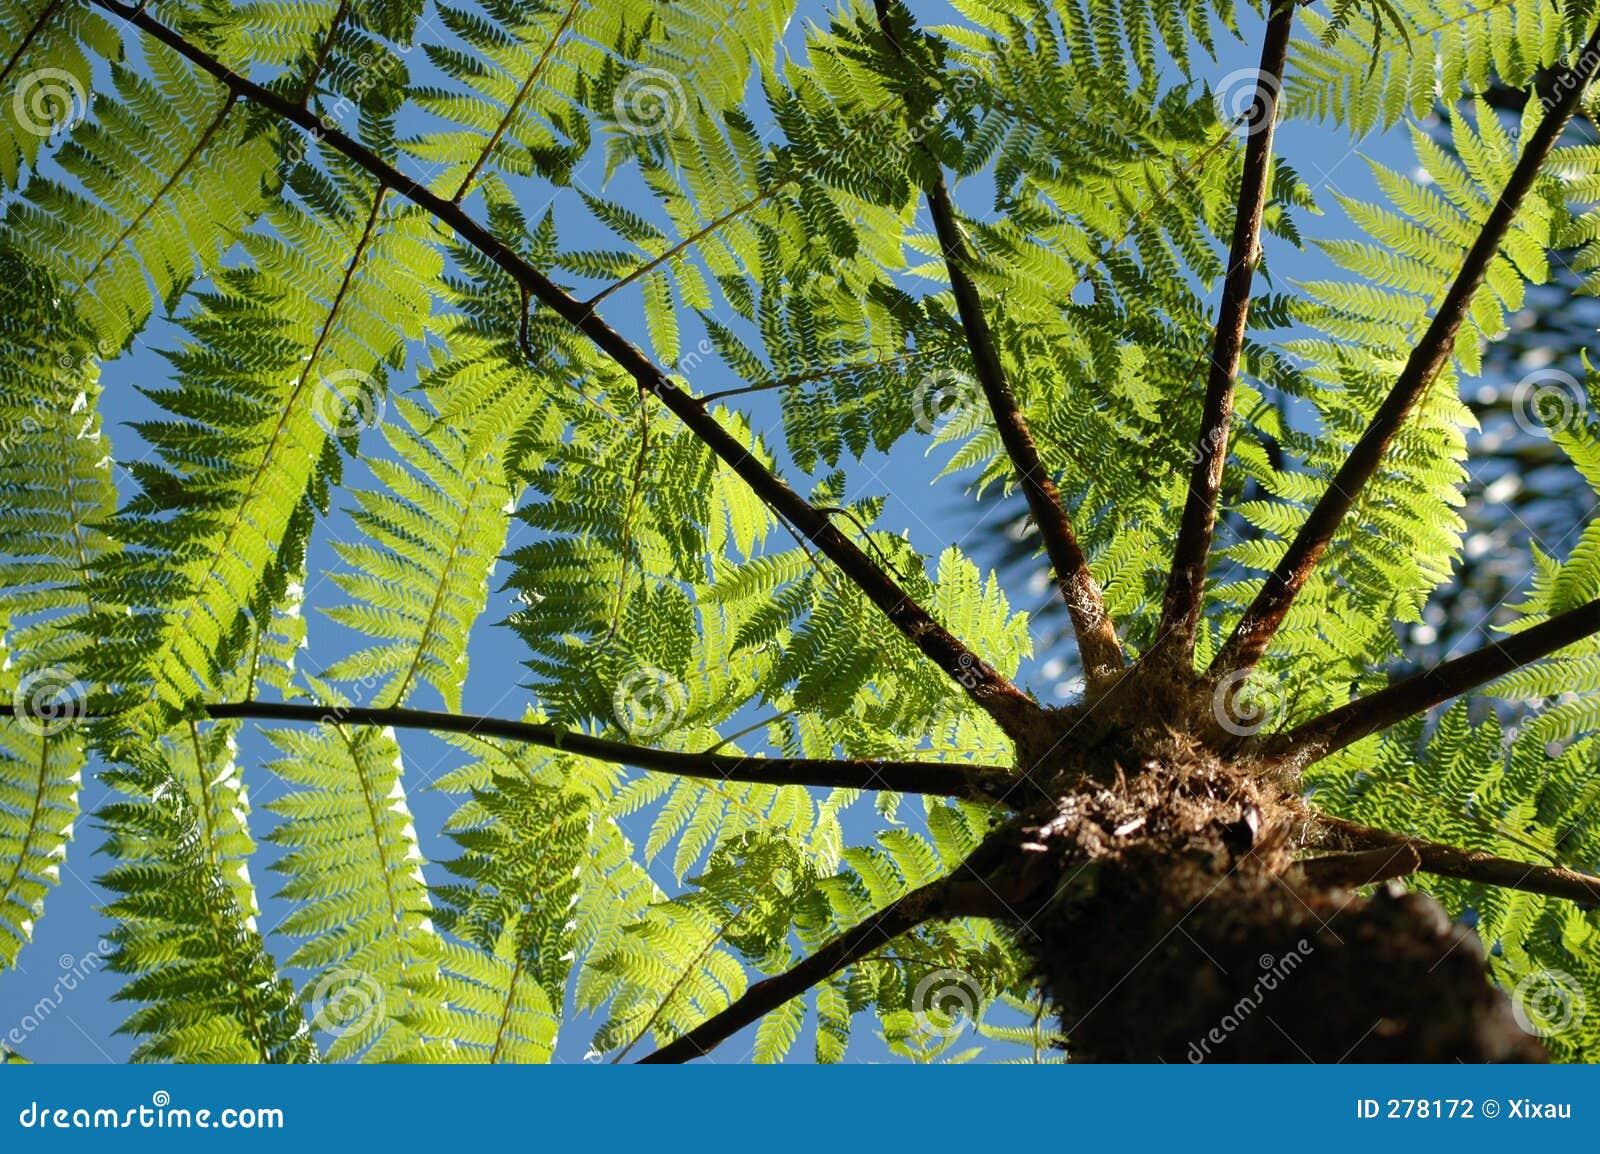 Ferntree